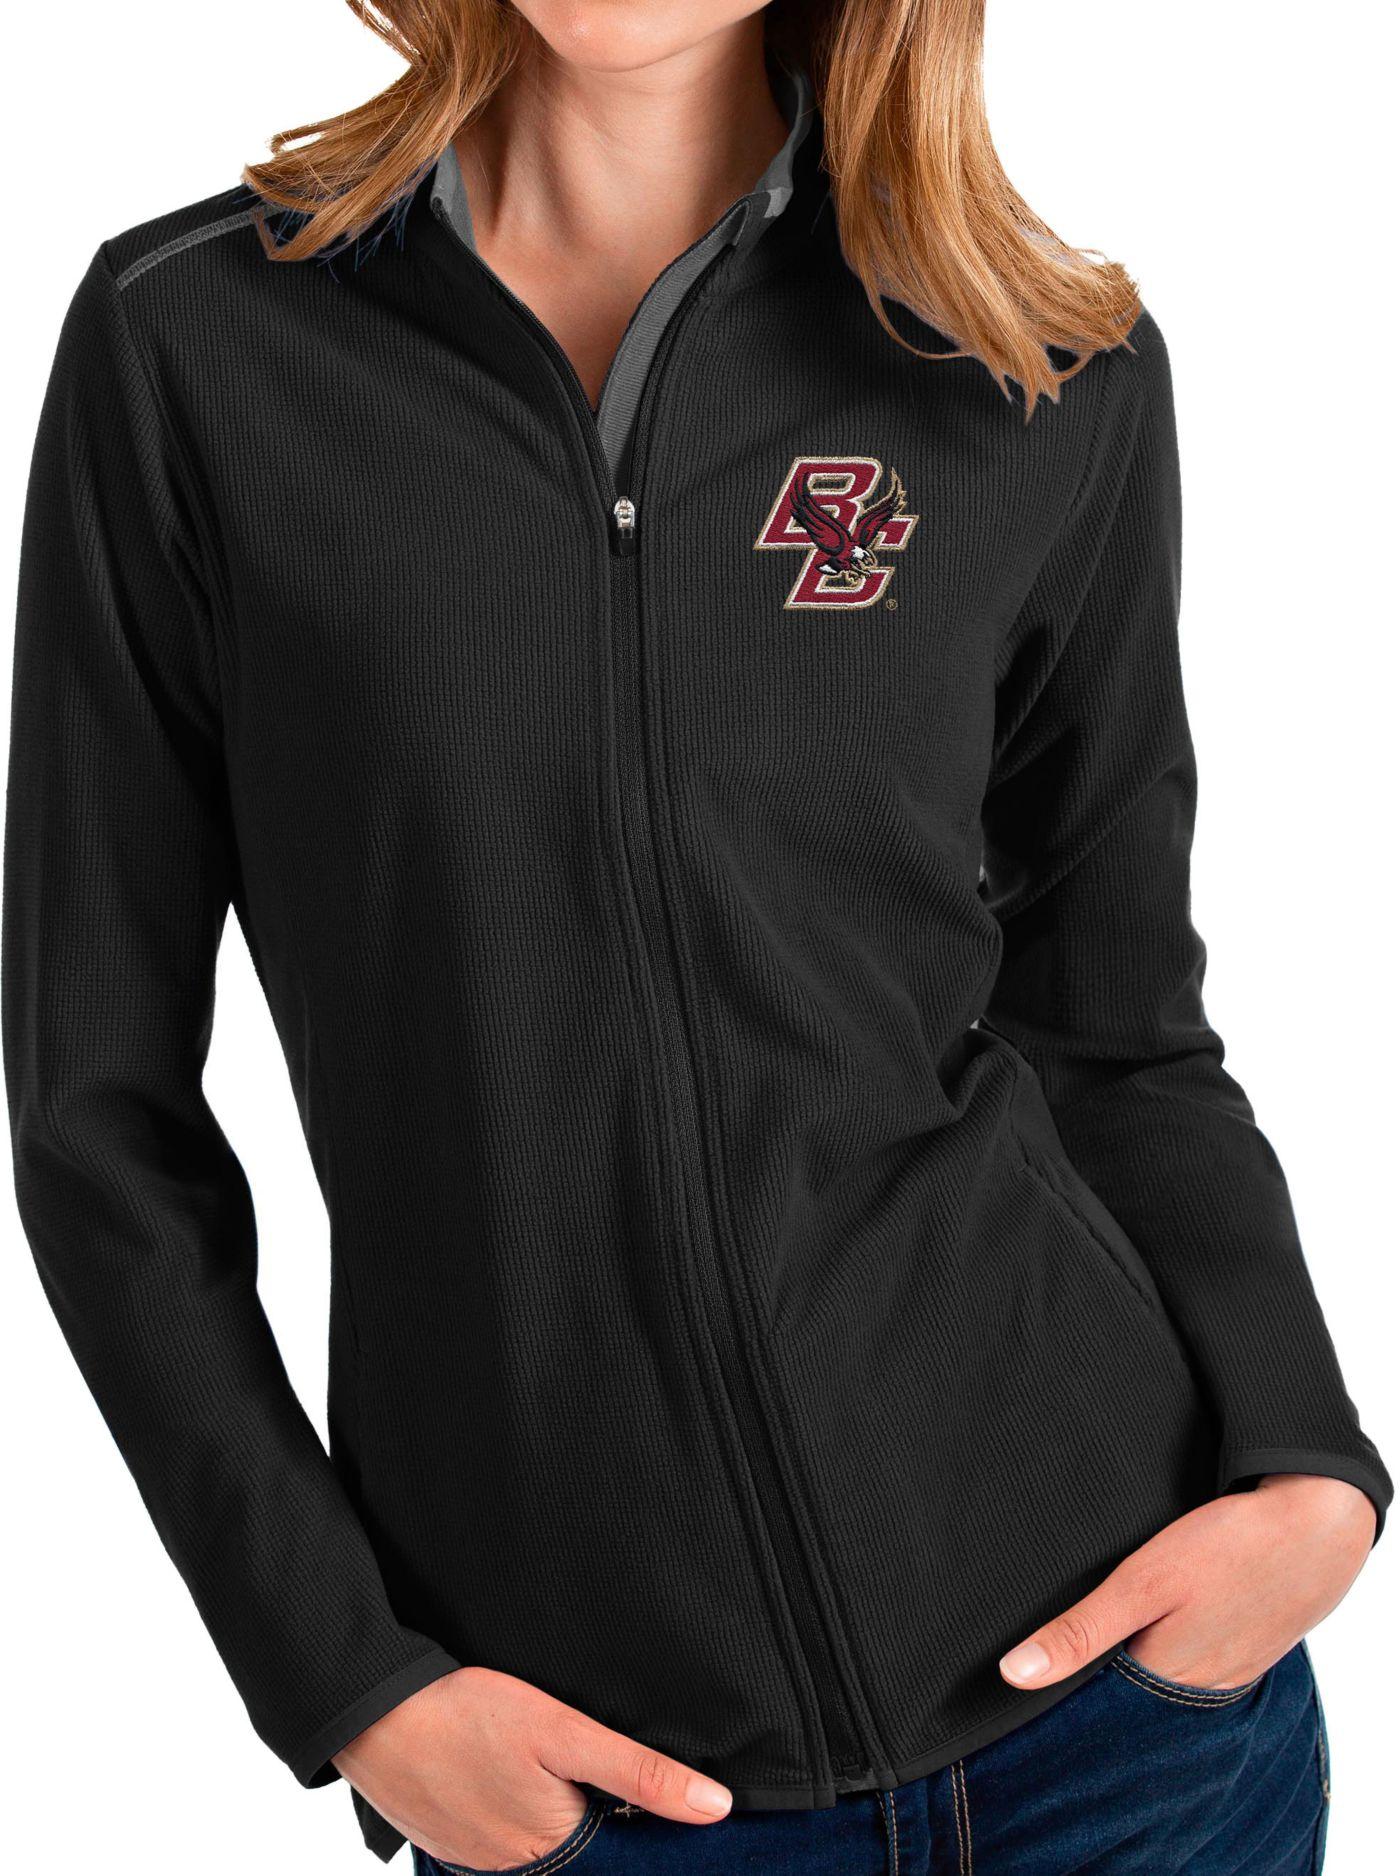 Antigua Women's Boston College Eagles Glacier Full-Zip Black Jacket